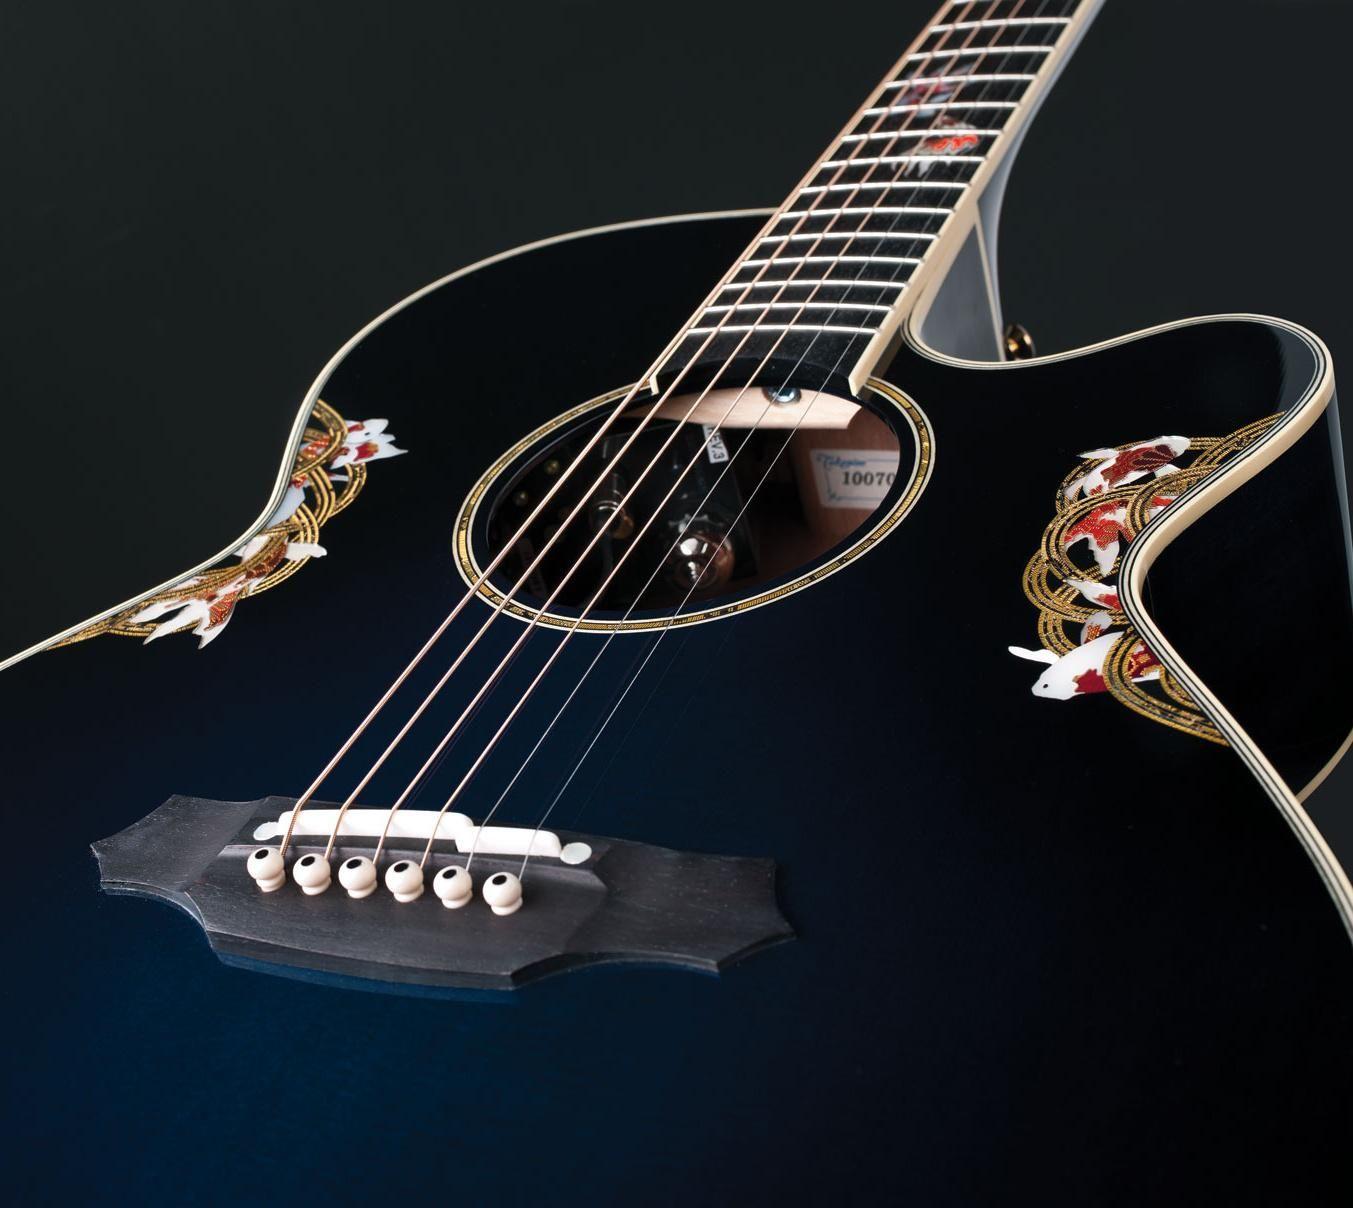 1353x1208 Takamine Guitar wallpaper by odiseox2 free